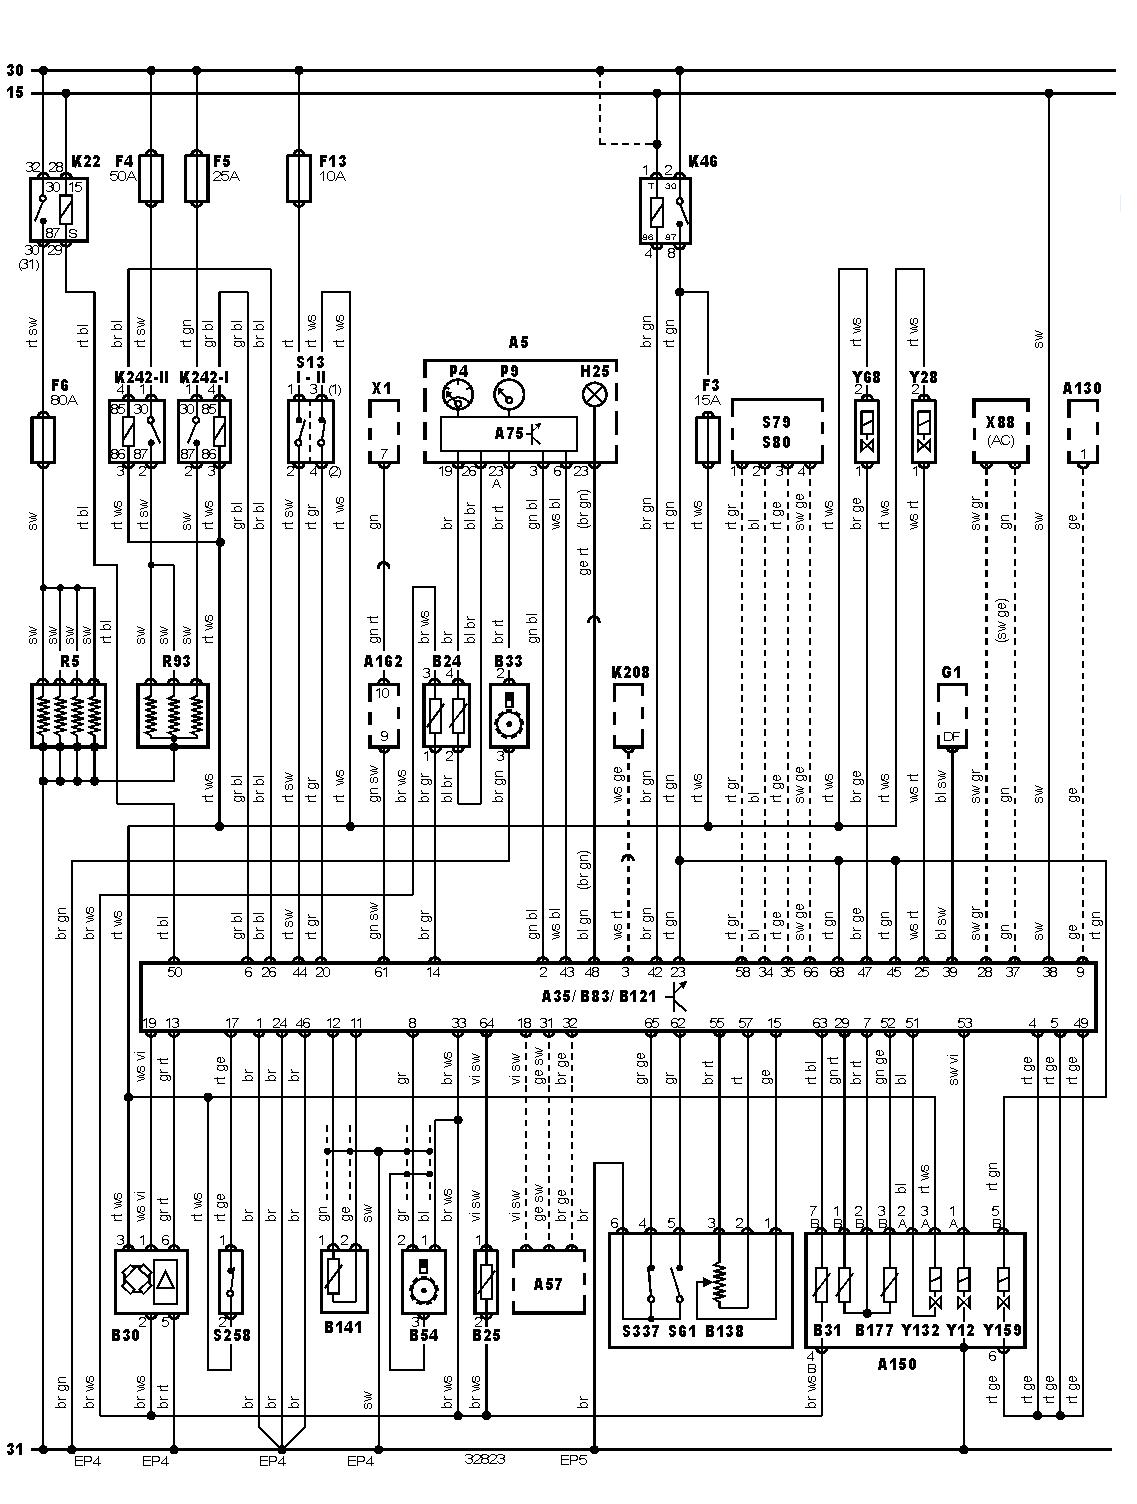 2000 Vw Jetta Vr6 Engine Diagram In Addition Ecu Wiring Diagram Vw